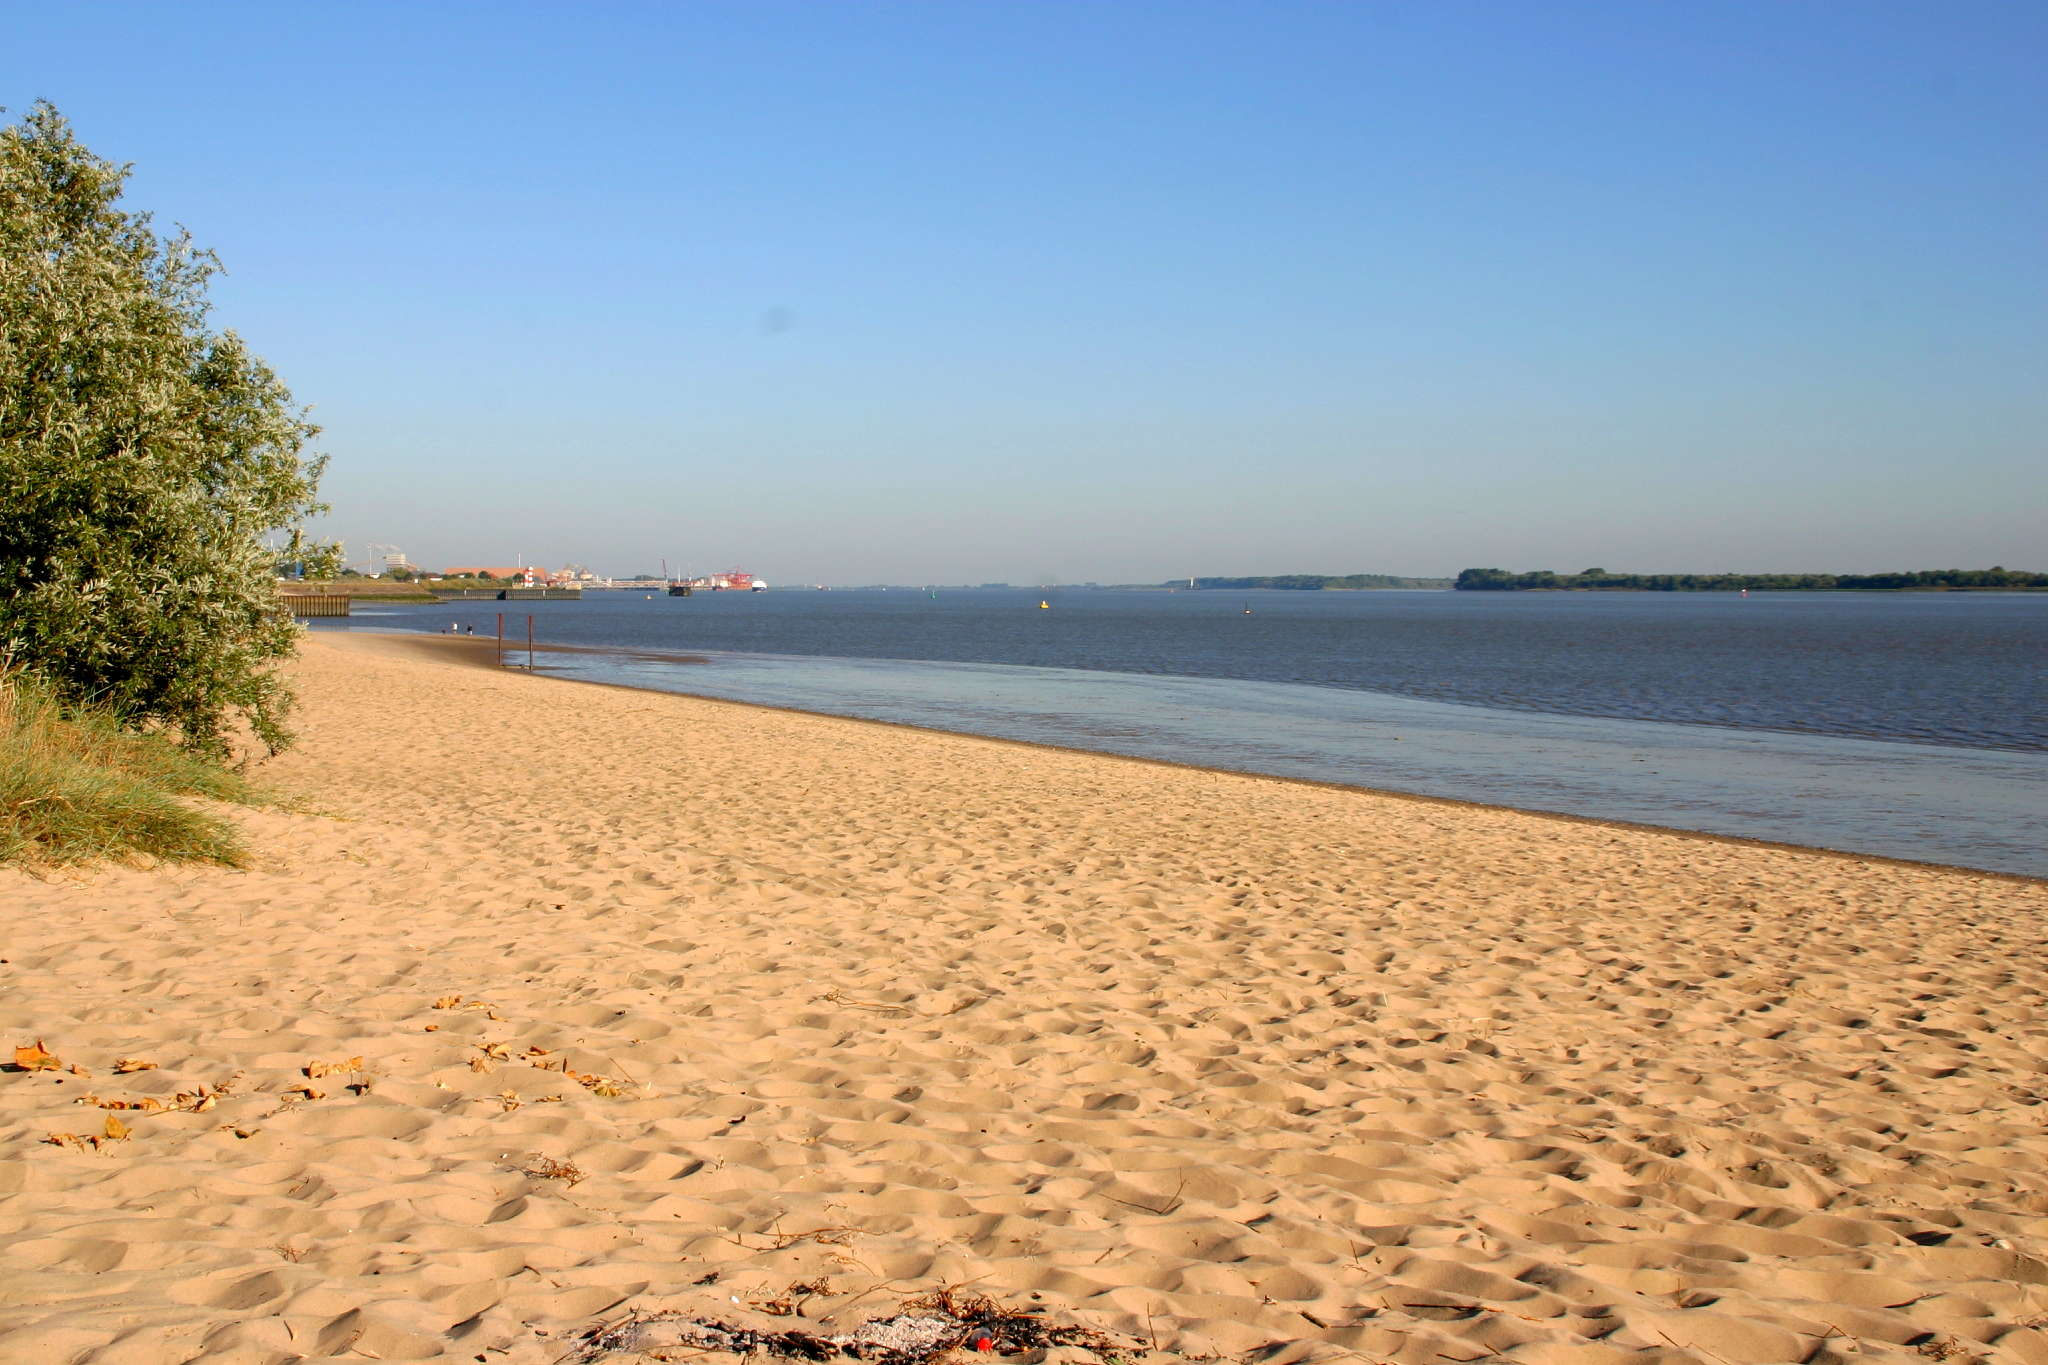 Baden in der Elbe (Strandbad Bassenfleth